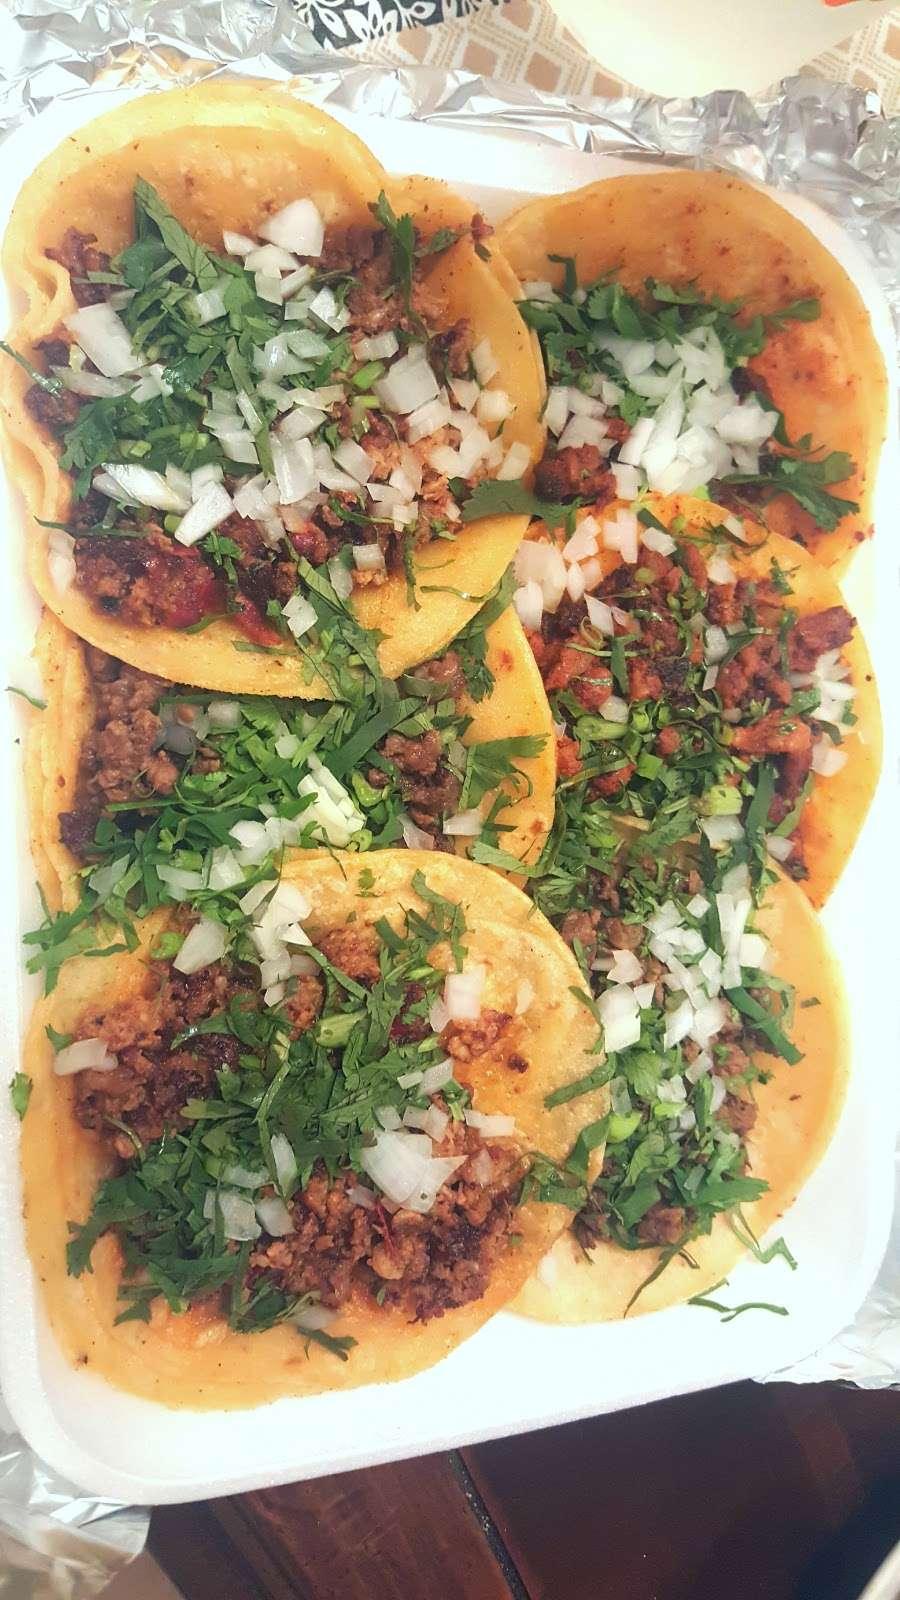 Mi PUEBLITO - restaurant    Photo 6 of 10   Address: 1202 Allen Genoa Rd, Houston, TX 77017, USA   Phone: (713) 815-1158